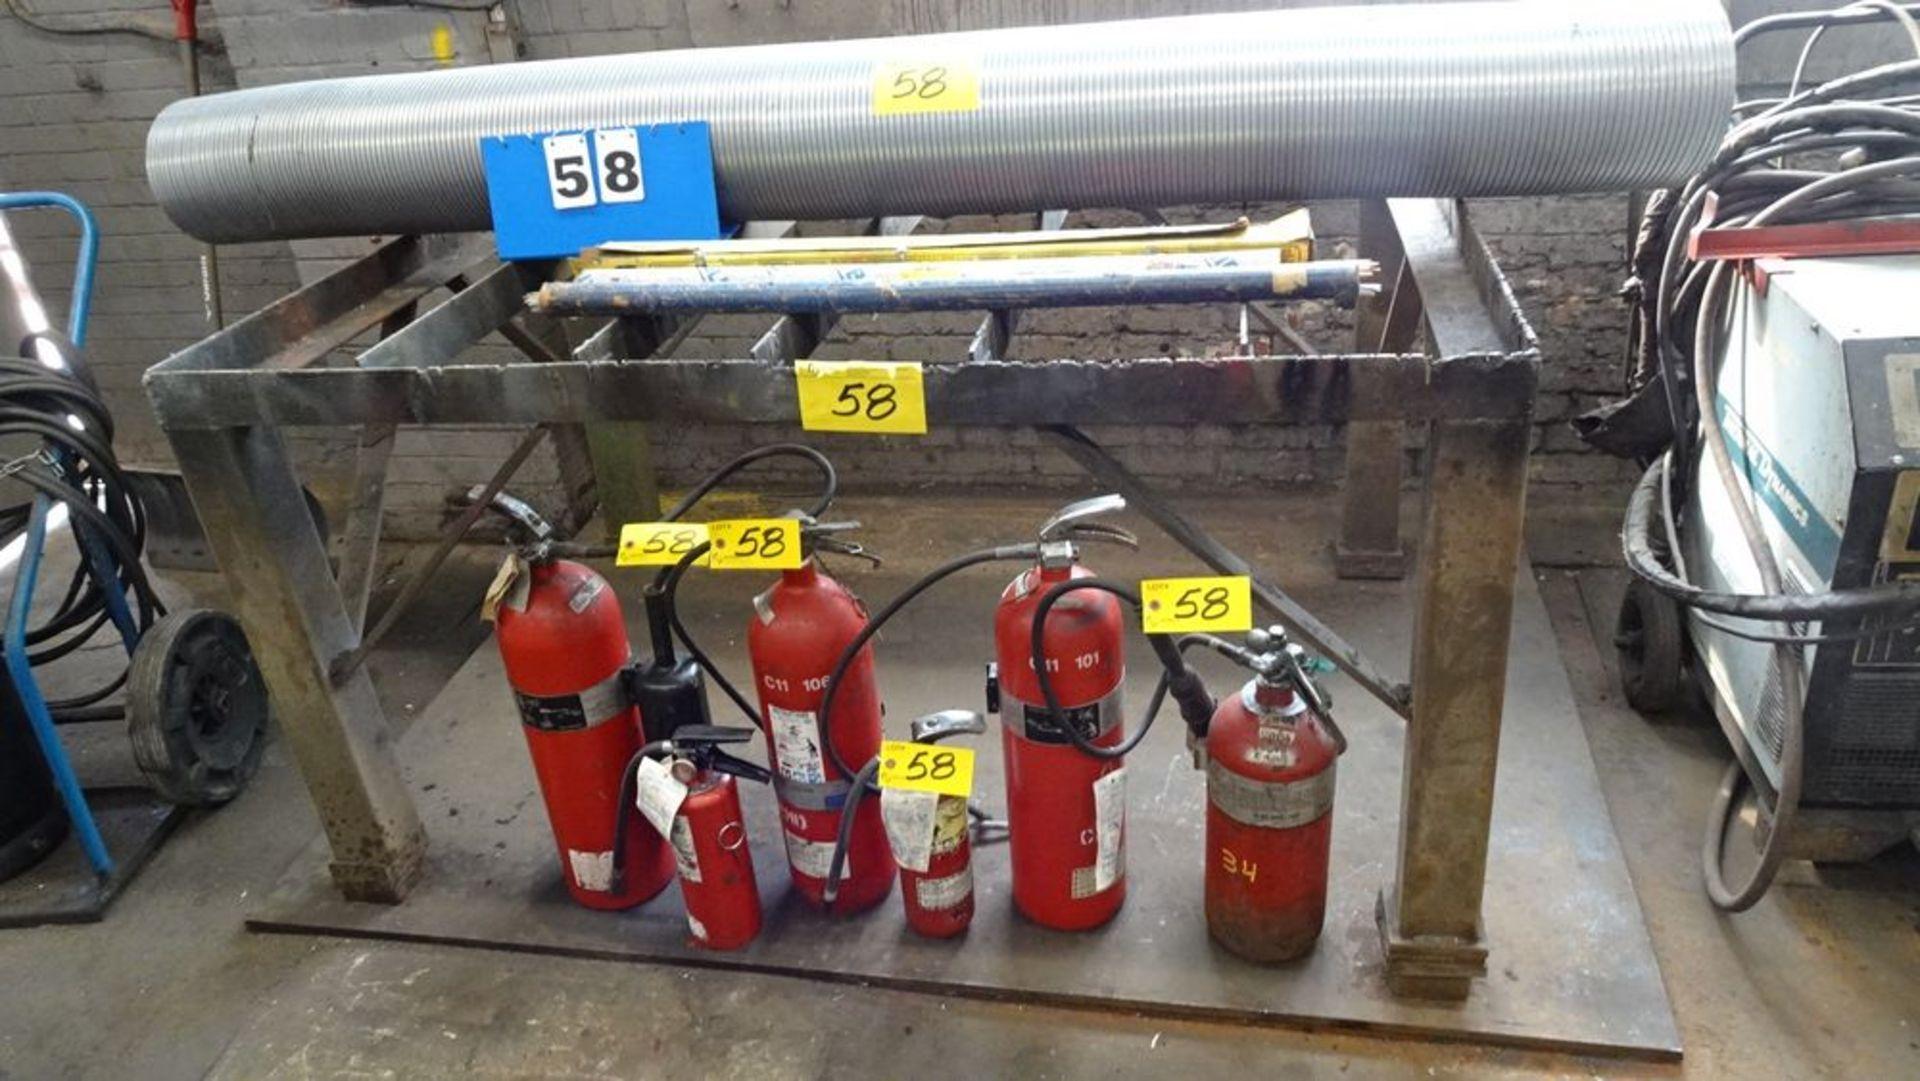 "Lot 58 - 48"" X 68"" STEEL CUTTING TABLE C/W STEEL PLATE BASE, FIRE EXTINGUISHERS, PIPE & WELDING ROD ("